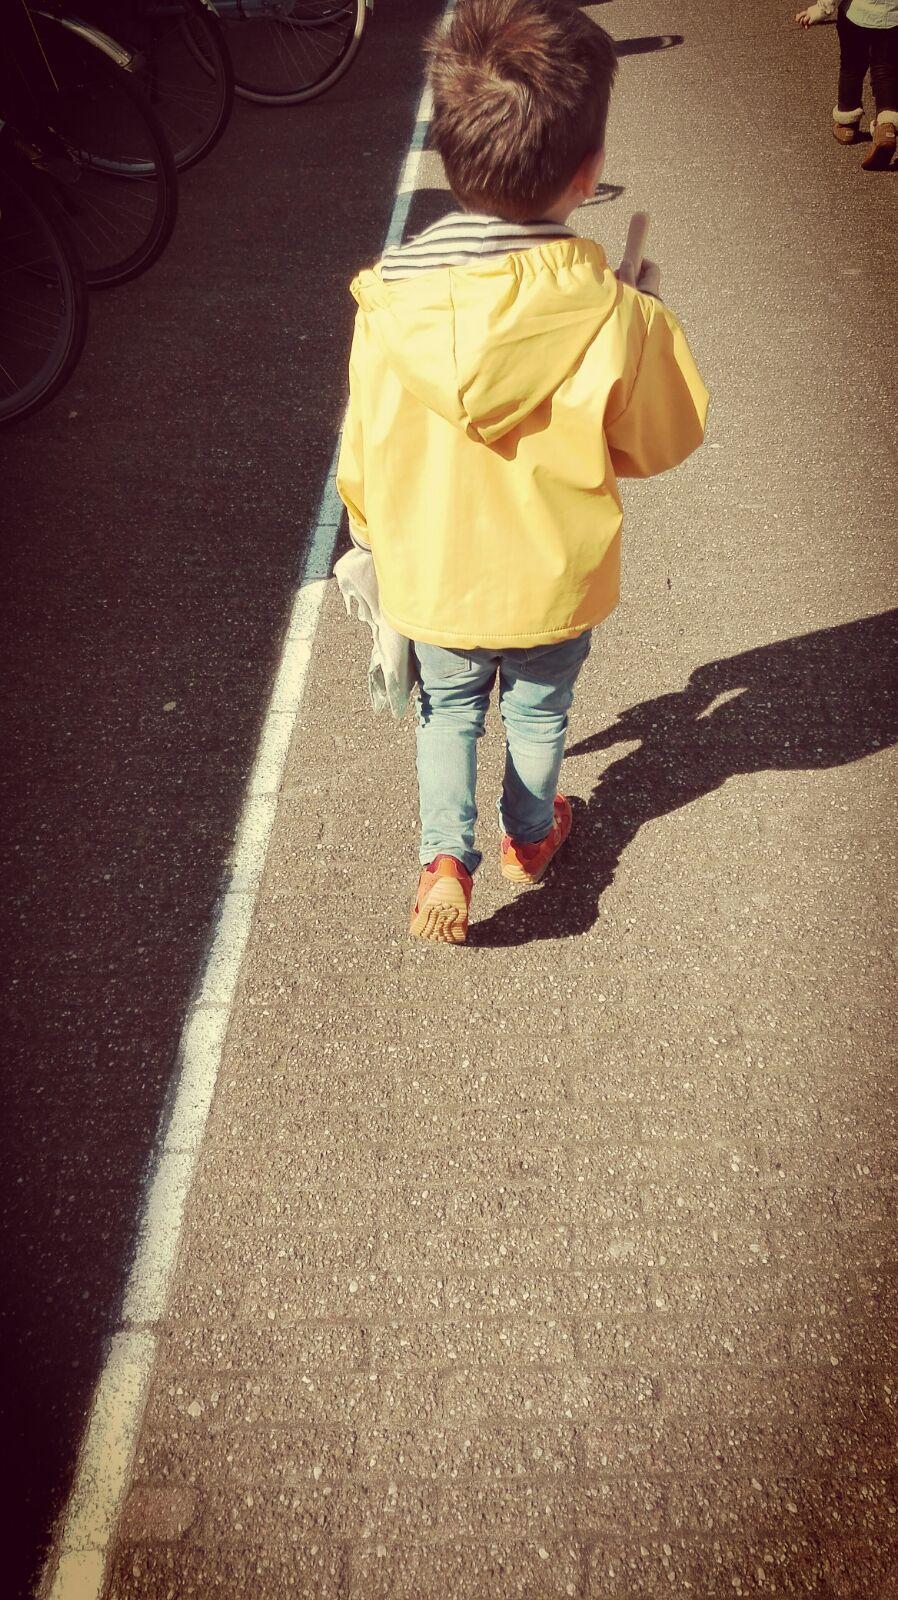 04f08a0b740 5-16-naturino-schoenen-kleuter-sneakers-oranje-klittenband-